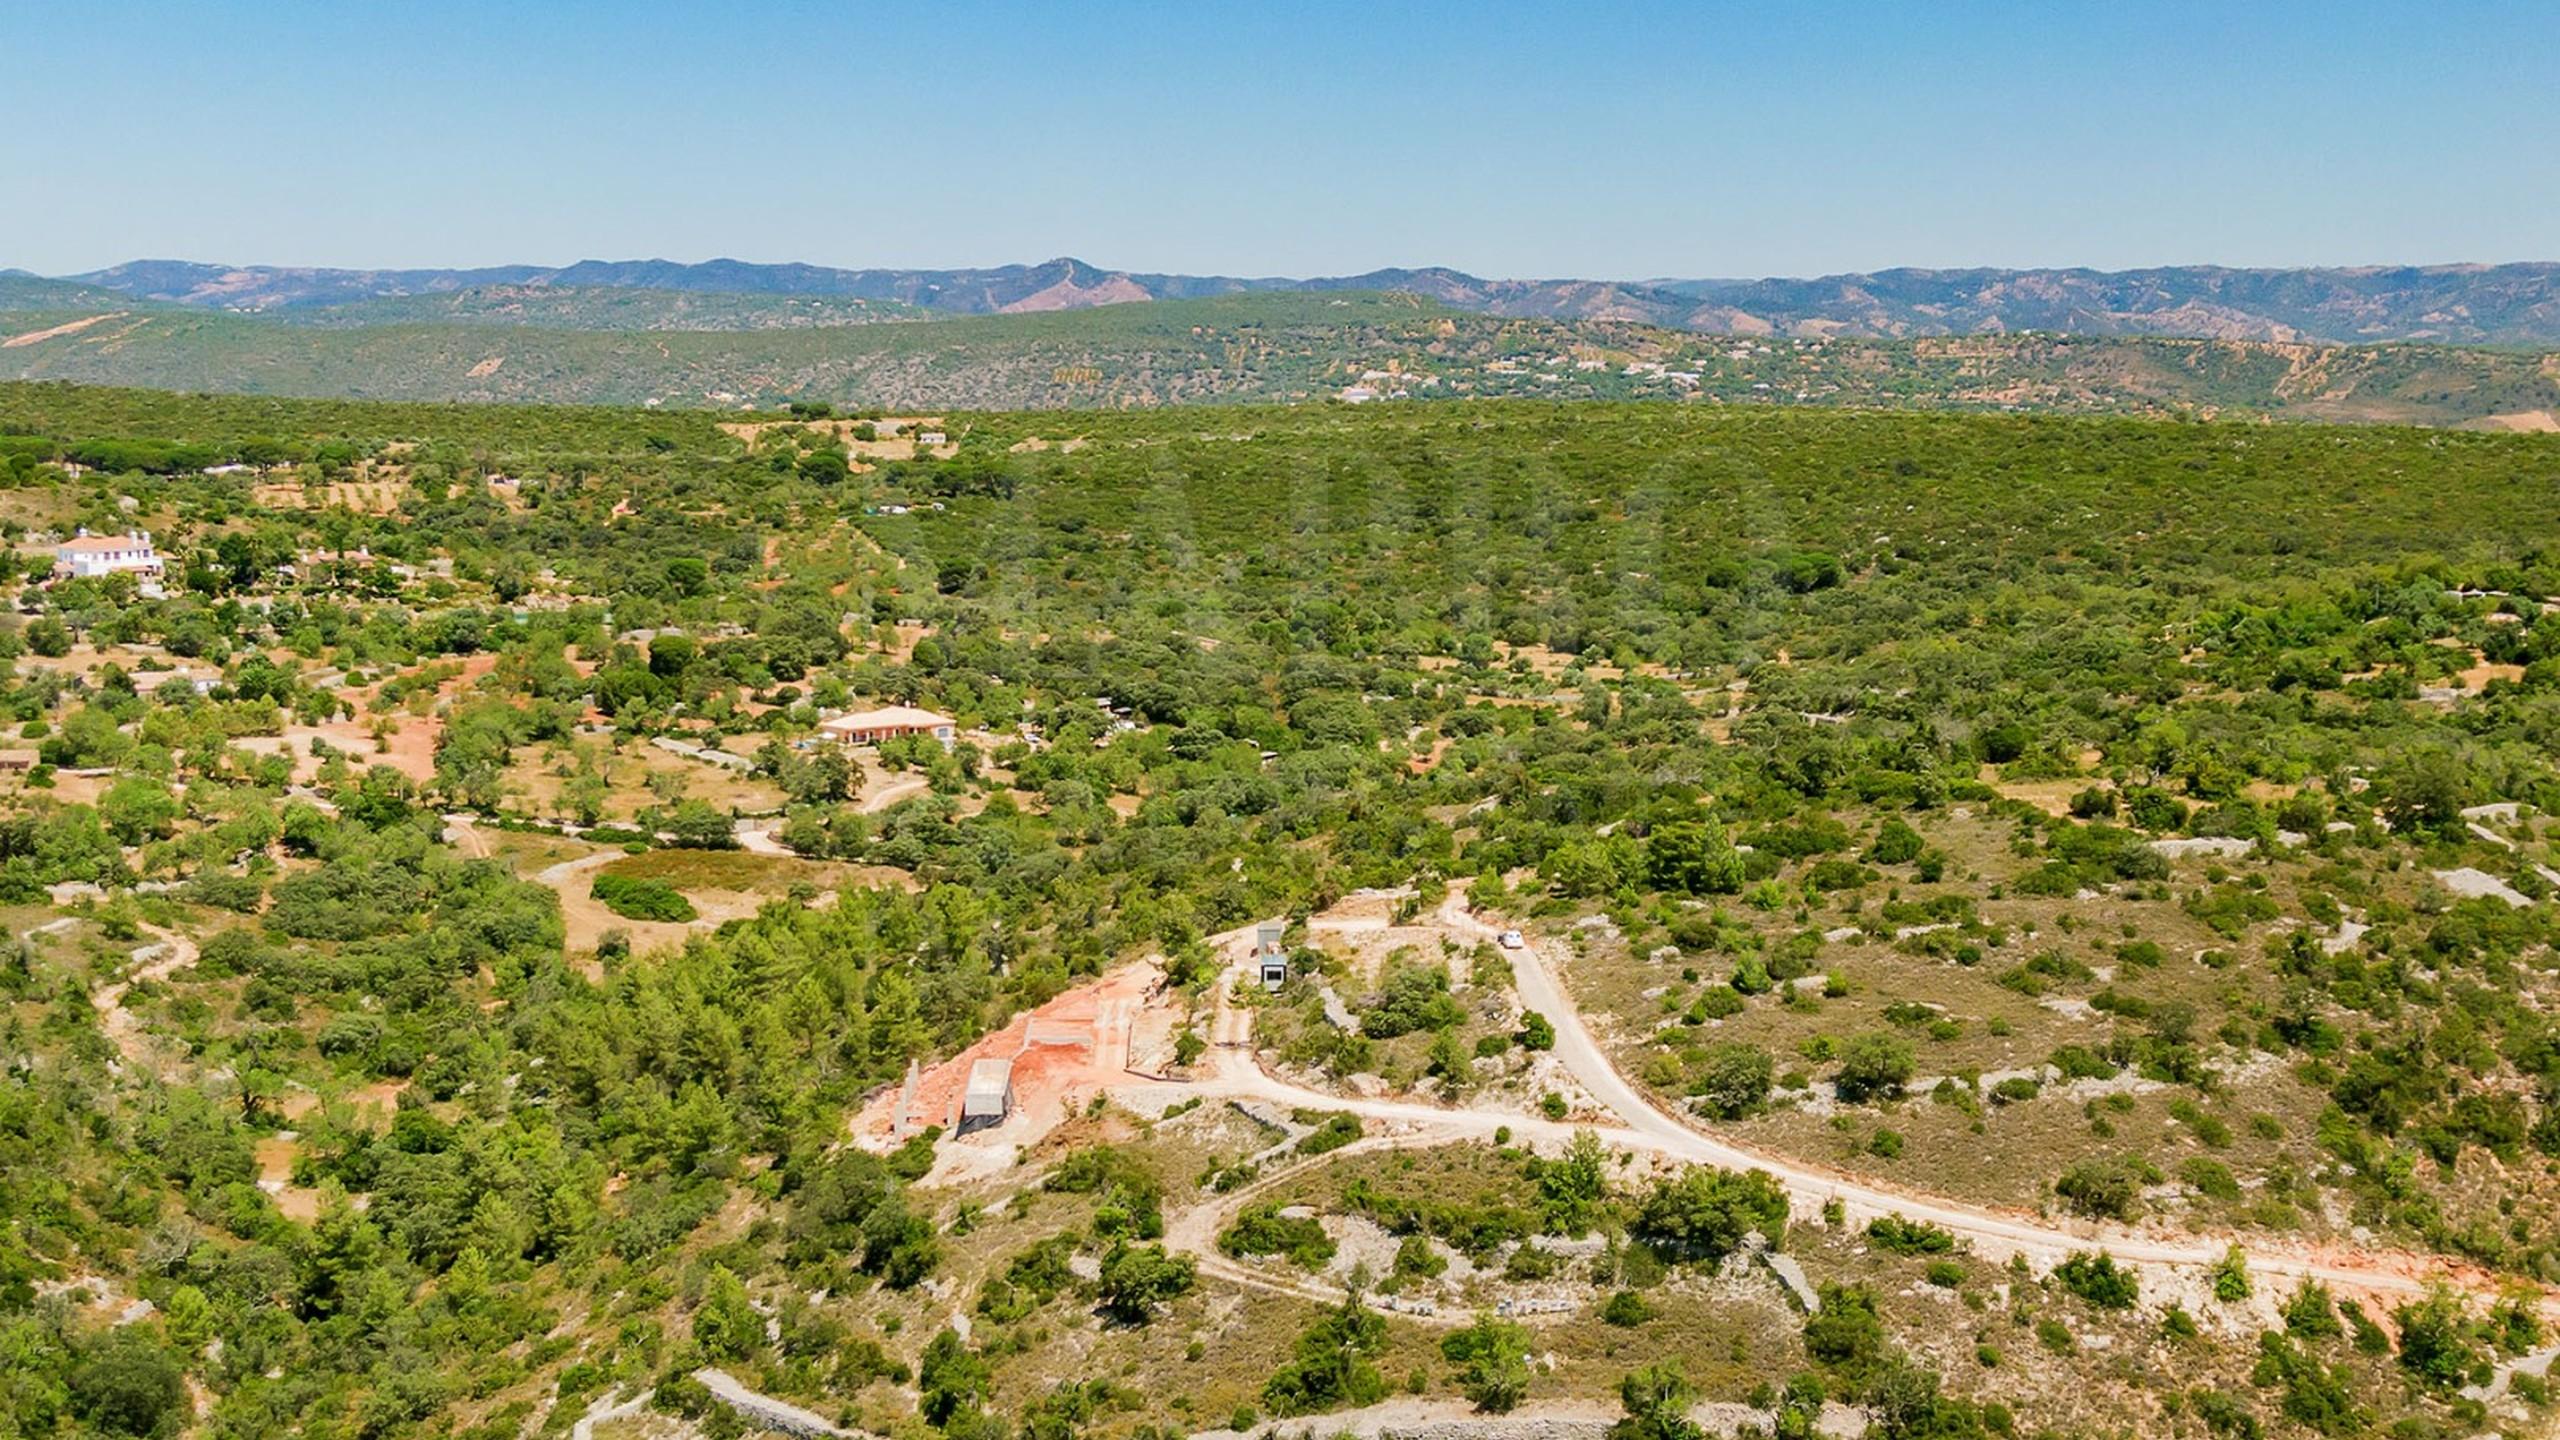 Moradia moderna para venda no Algarve, Portugal